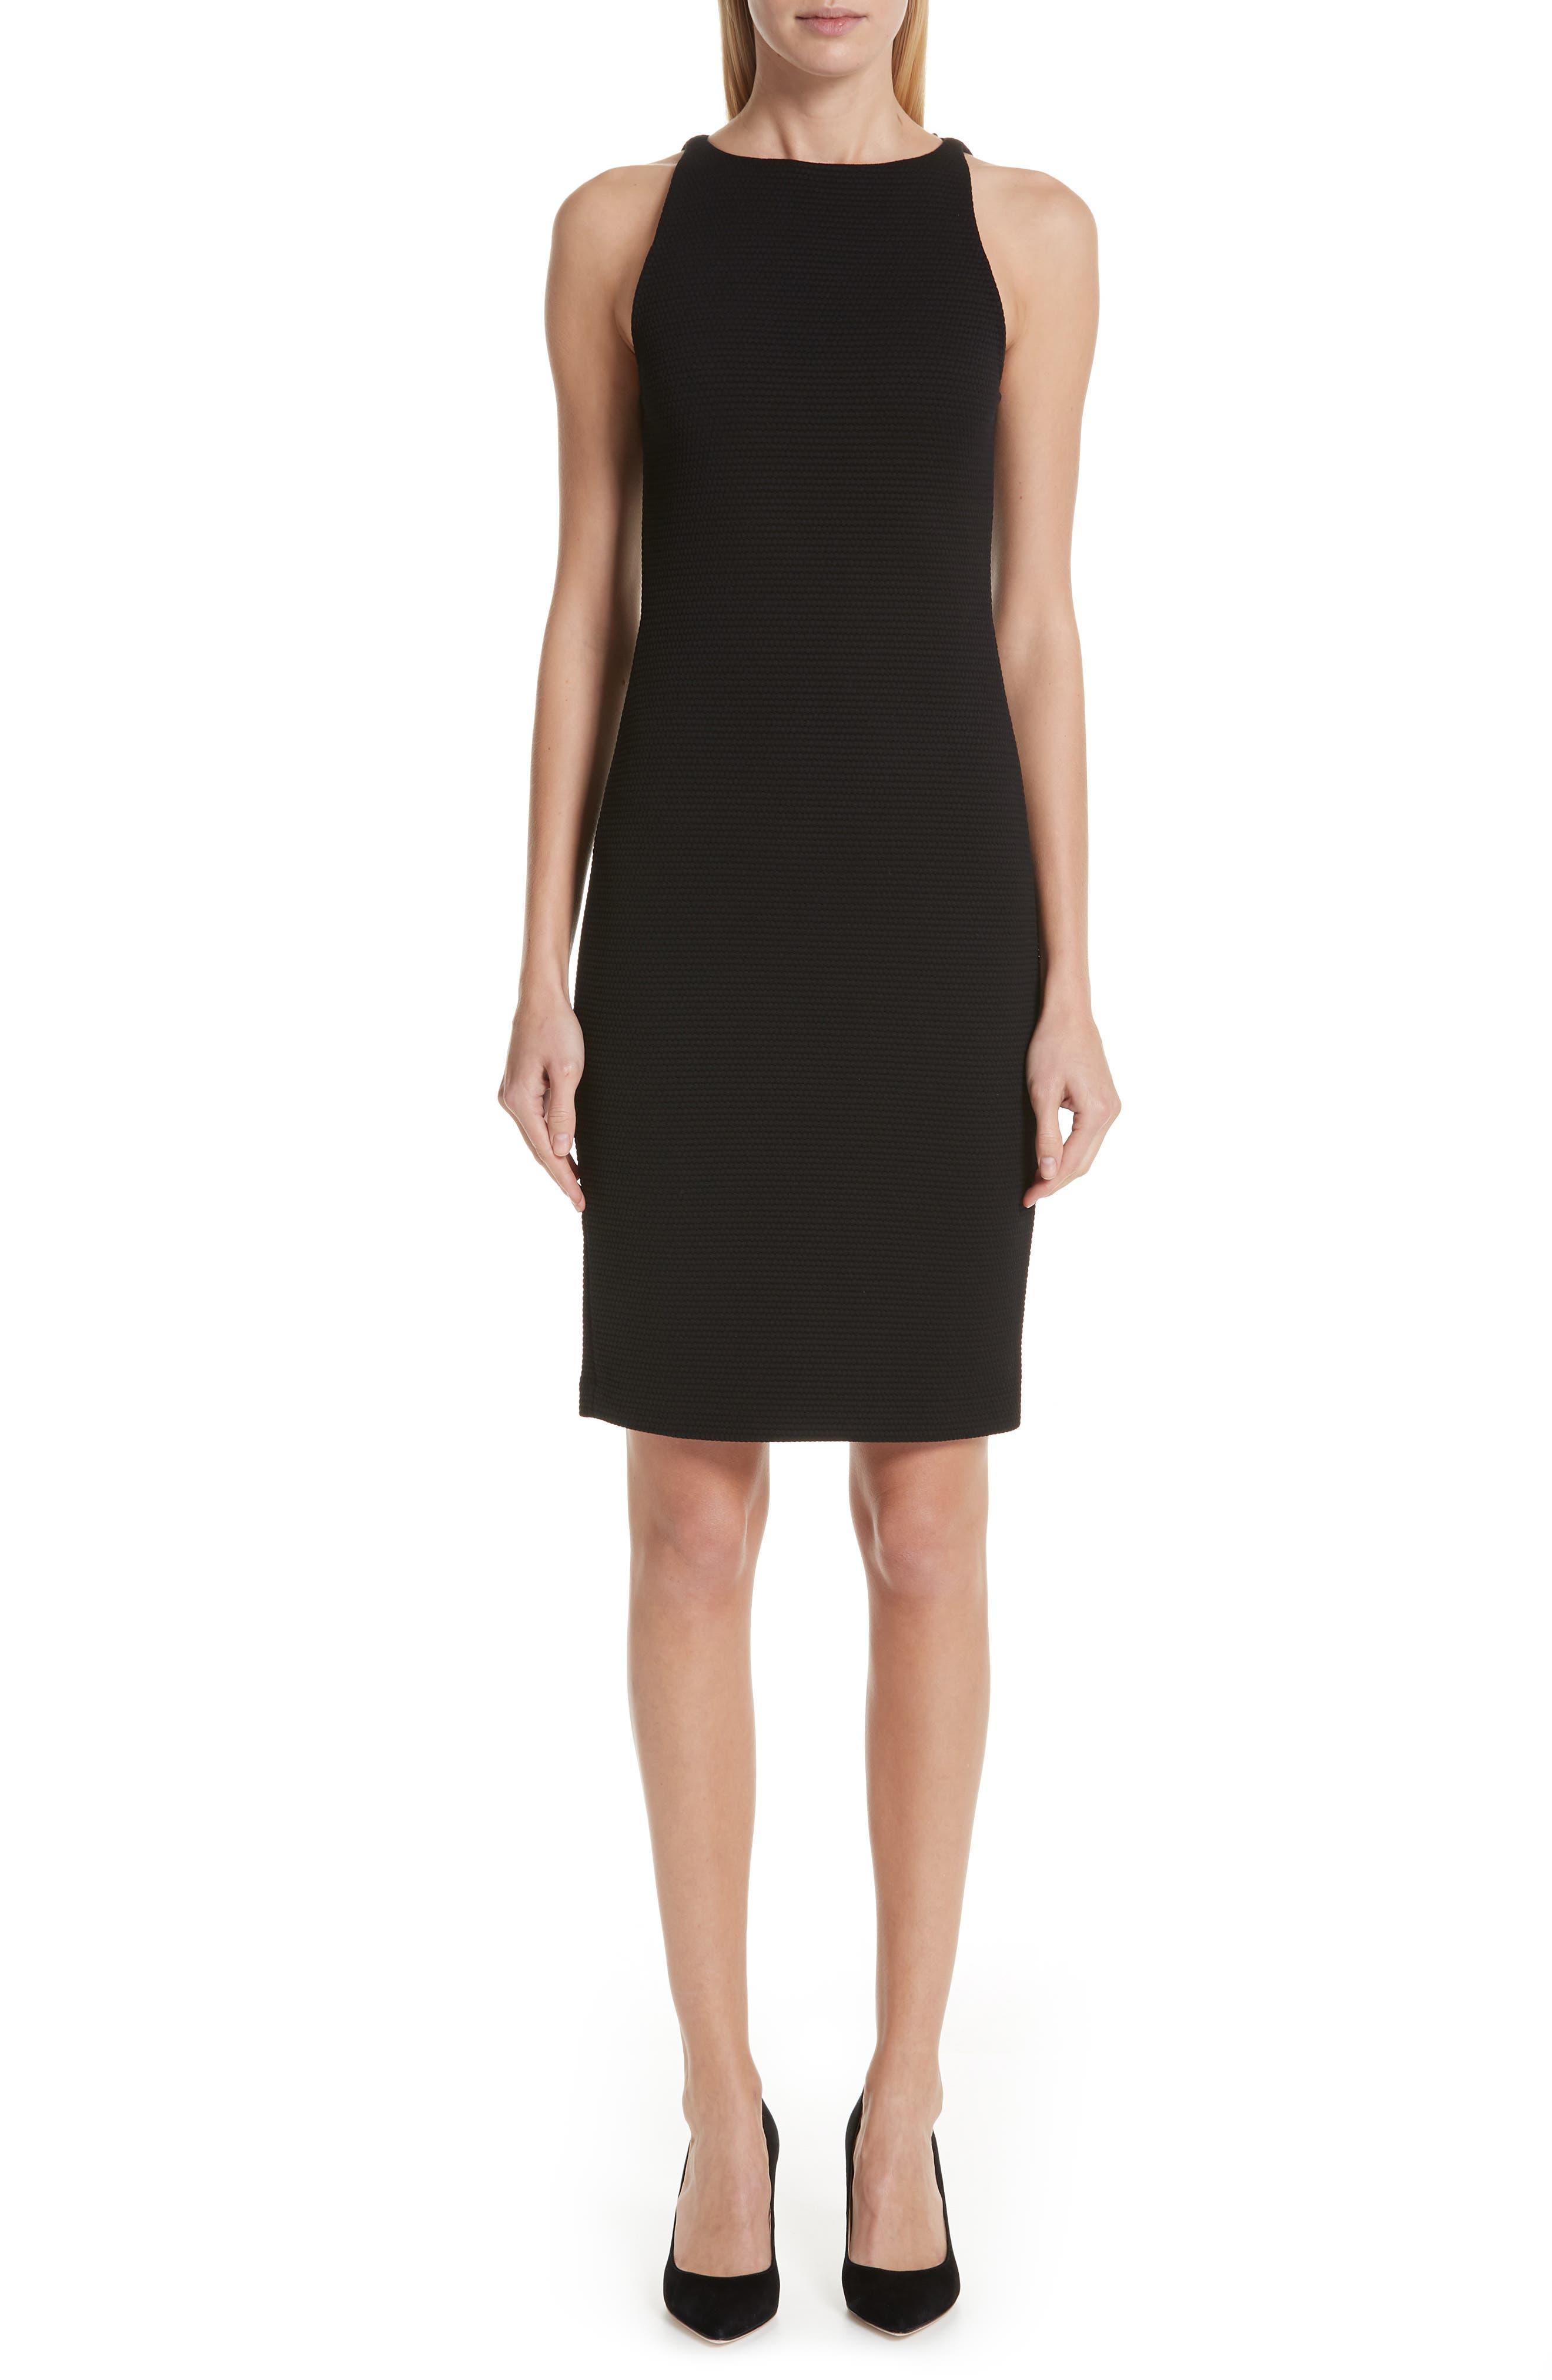 Emporio Armani Sleeveless Sheath Dress, 50 IT - Black